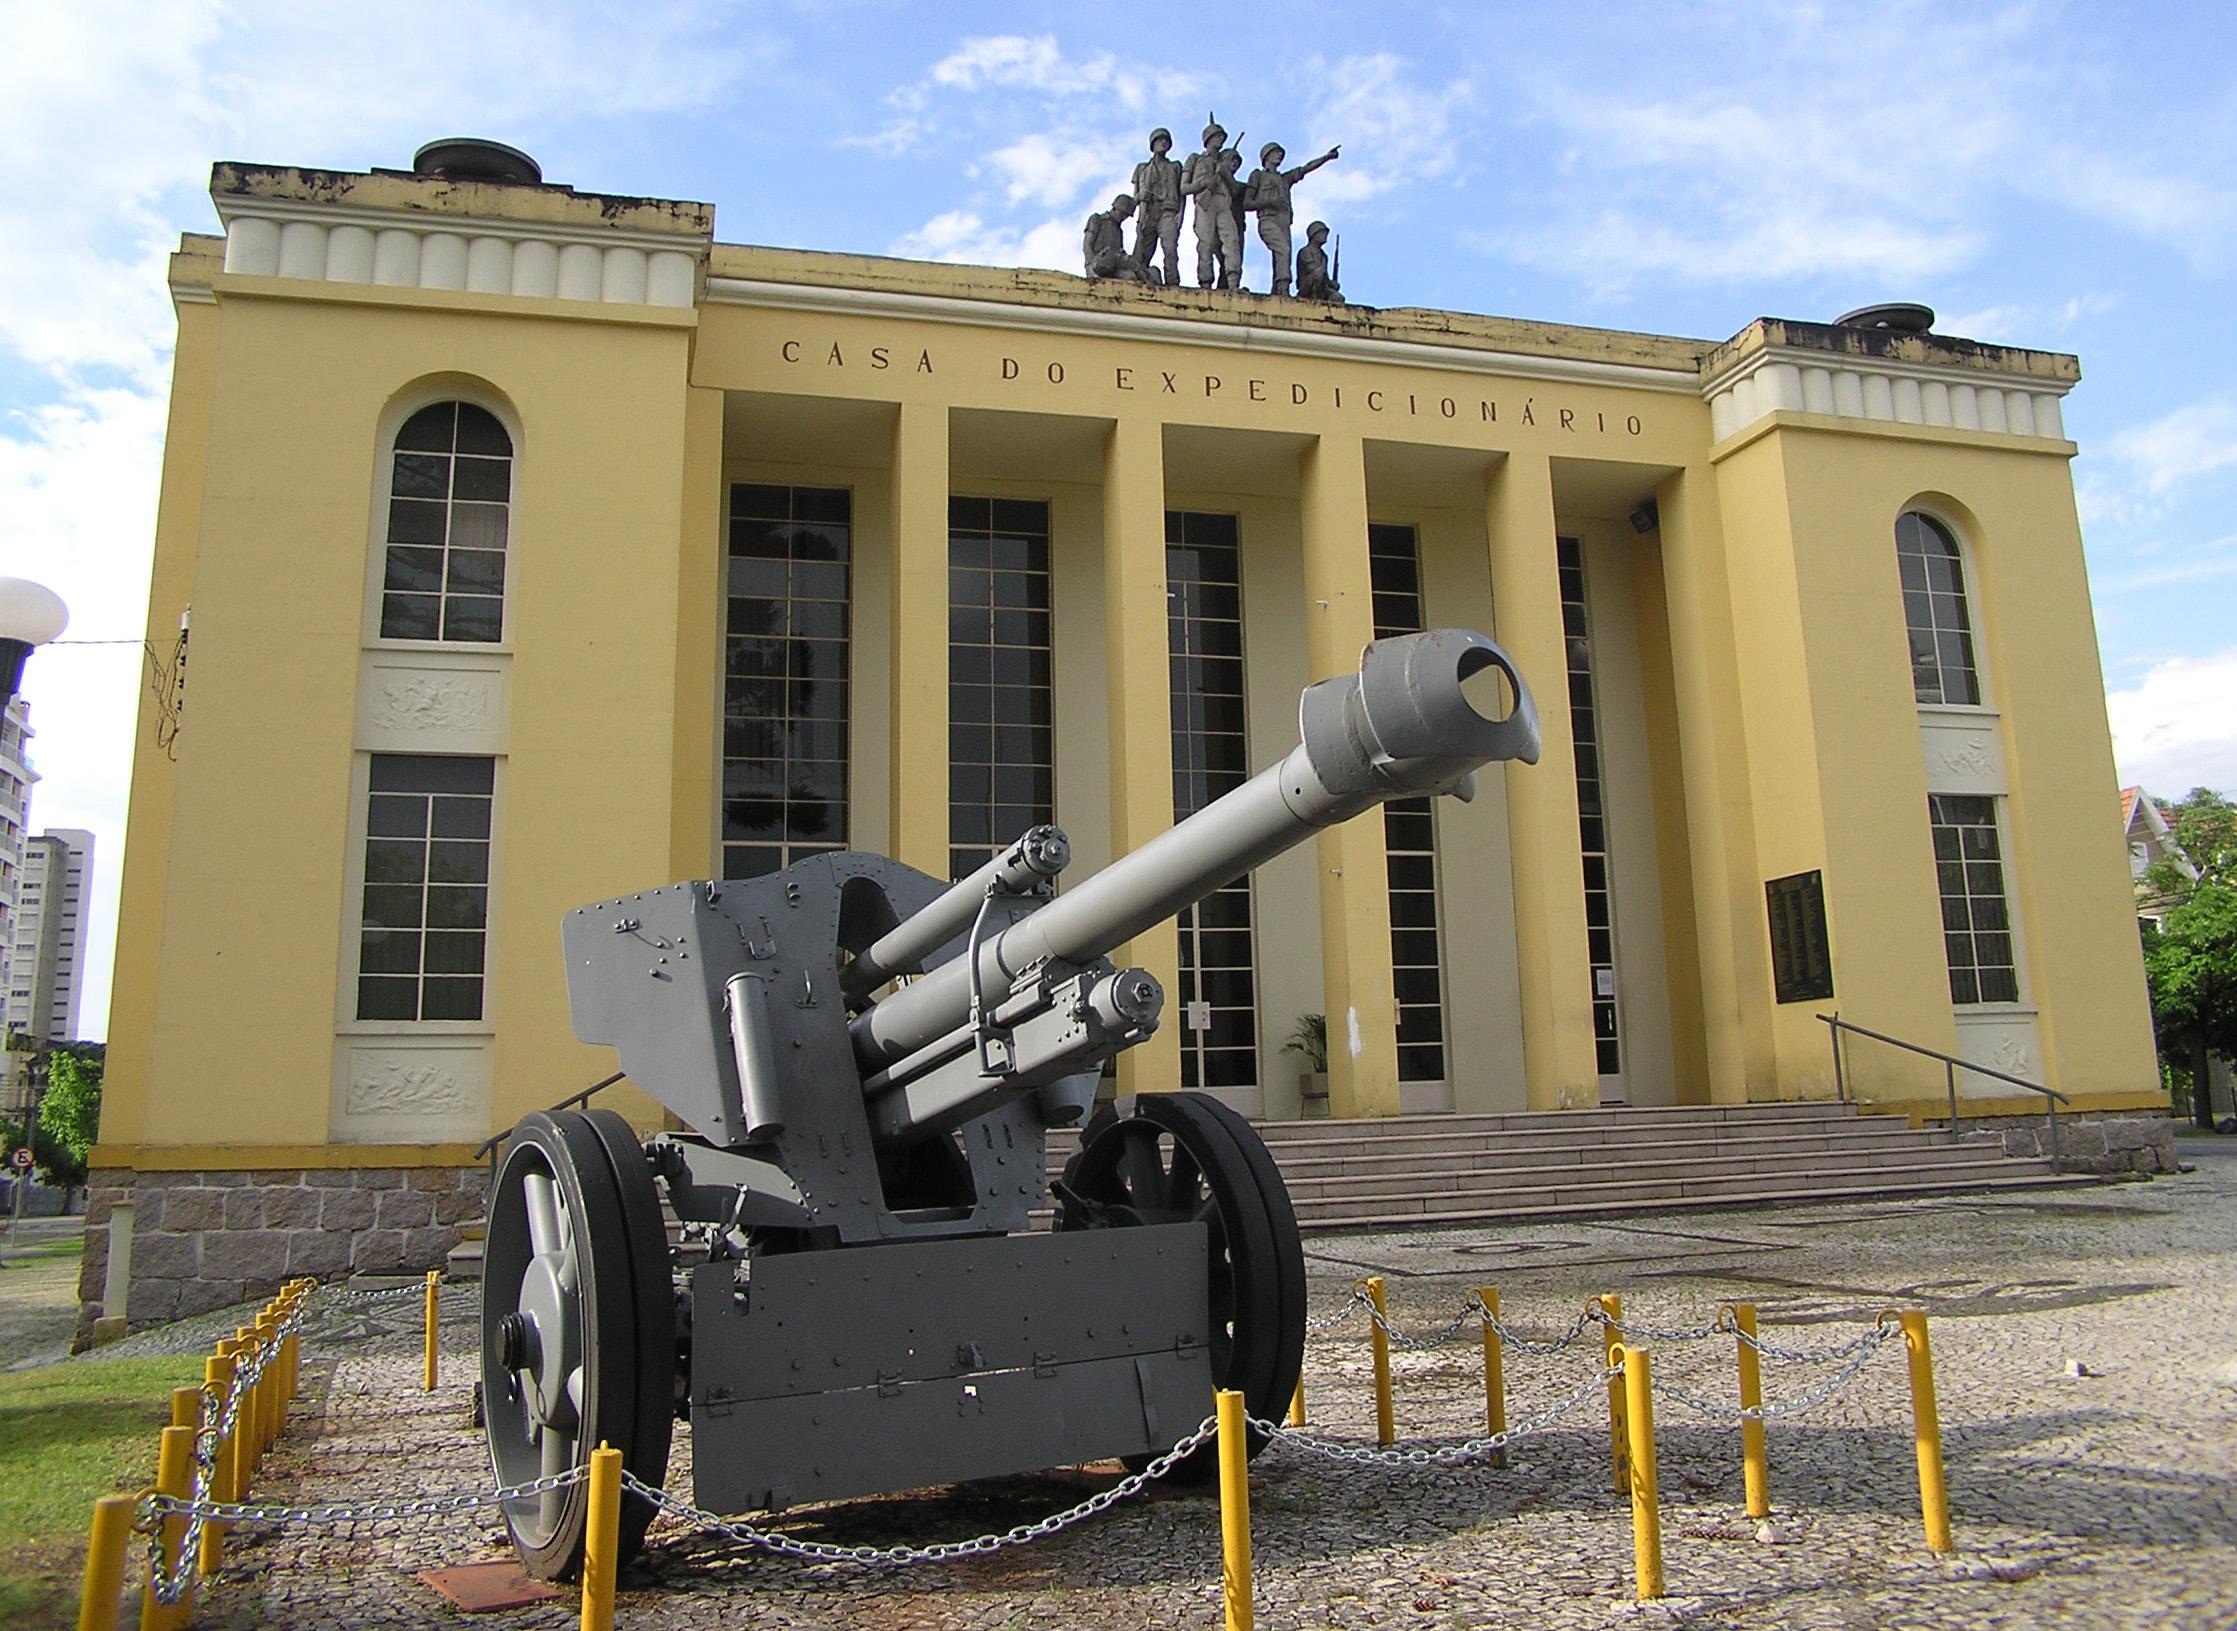 File:Museu do Expedicionario 2 Curitiba Brasil.jpg